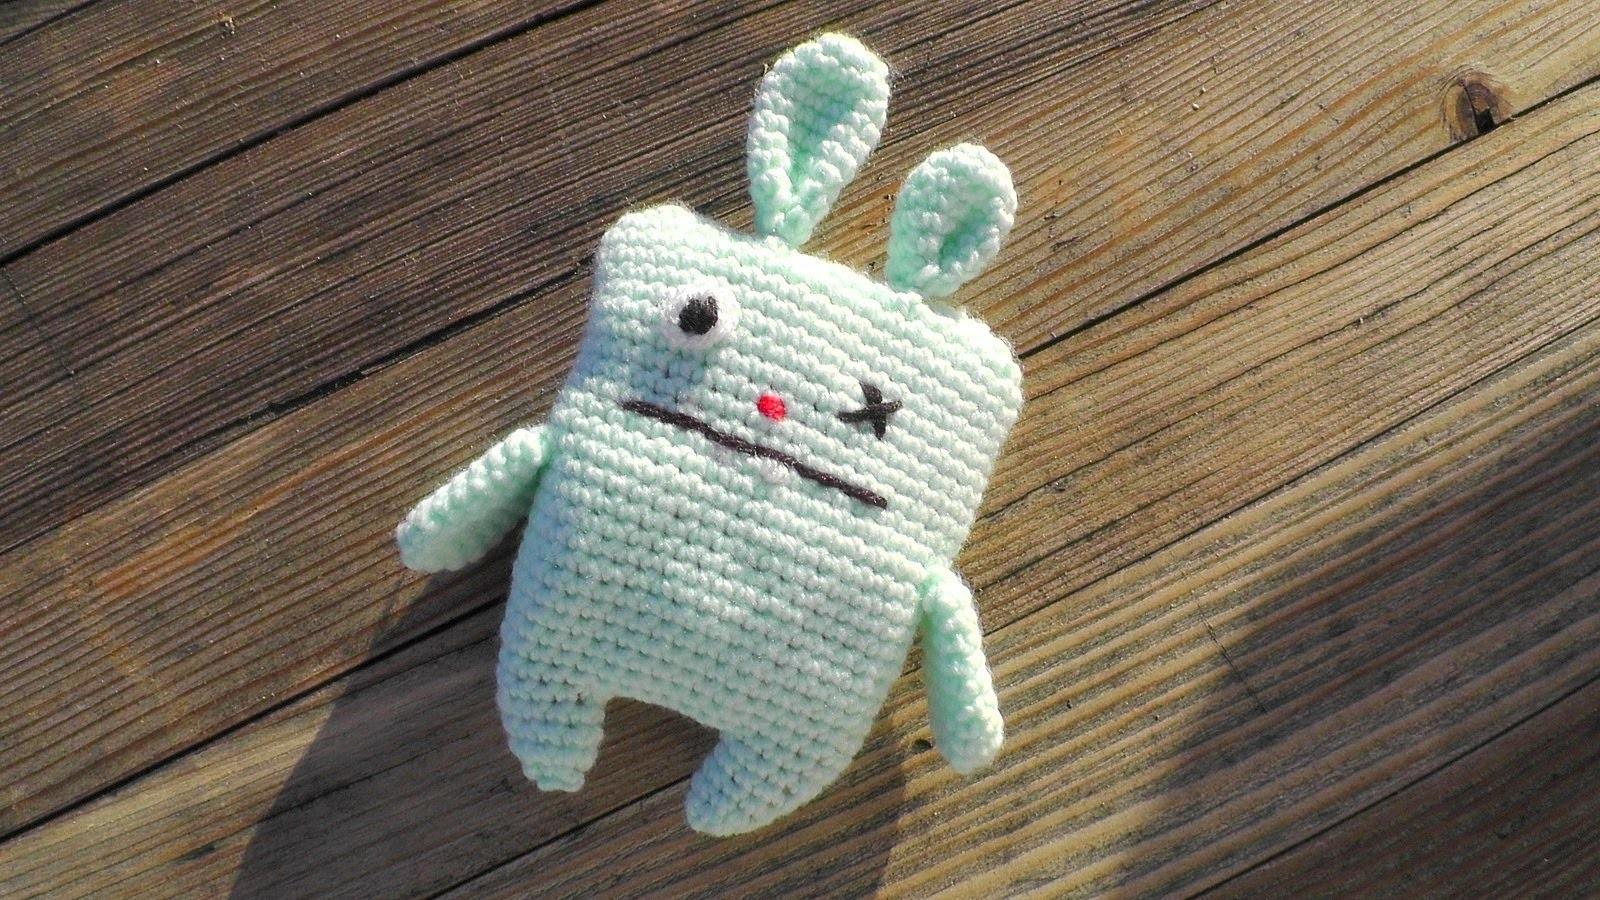 Ugly Bunny Amigurumi Häkelanleitung [Fortgeschrittene] Schachenmayr Baby Super Soft